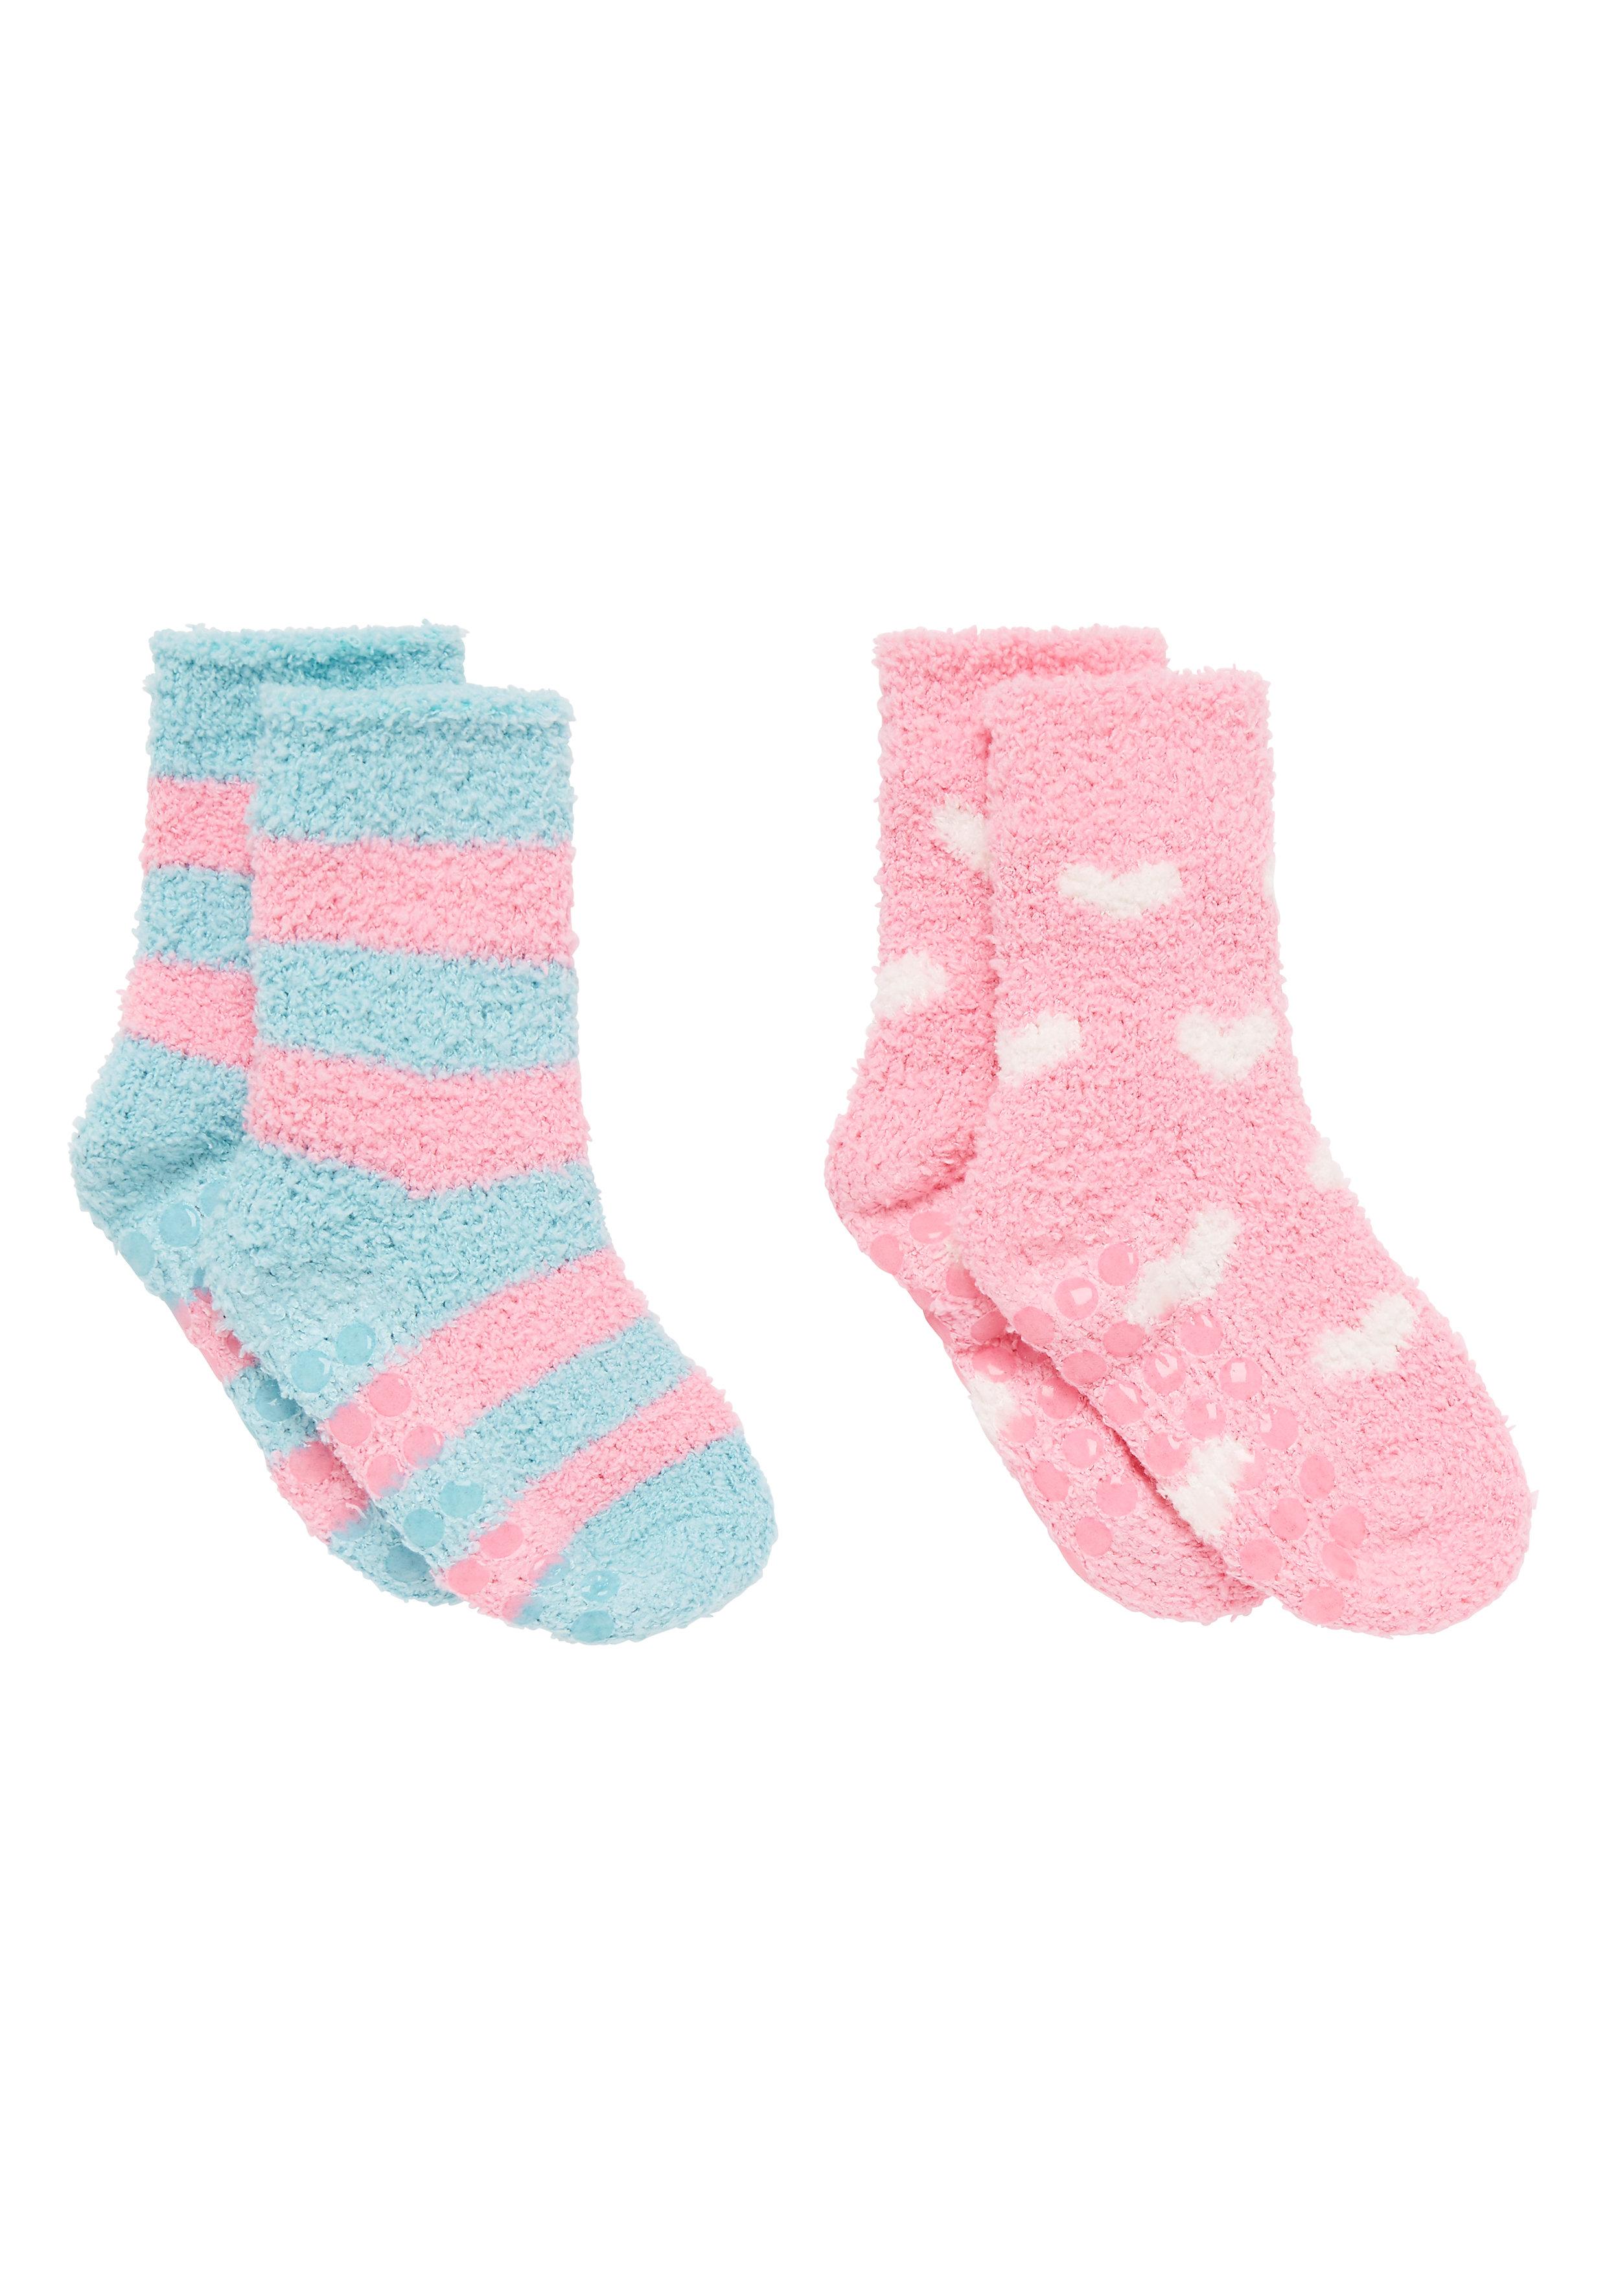 Mothercare | Girls Fluffy Socks Heart And Stripe Design - Pack Of 2 - Pink